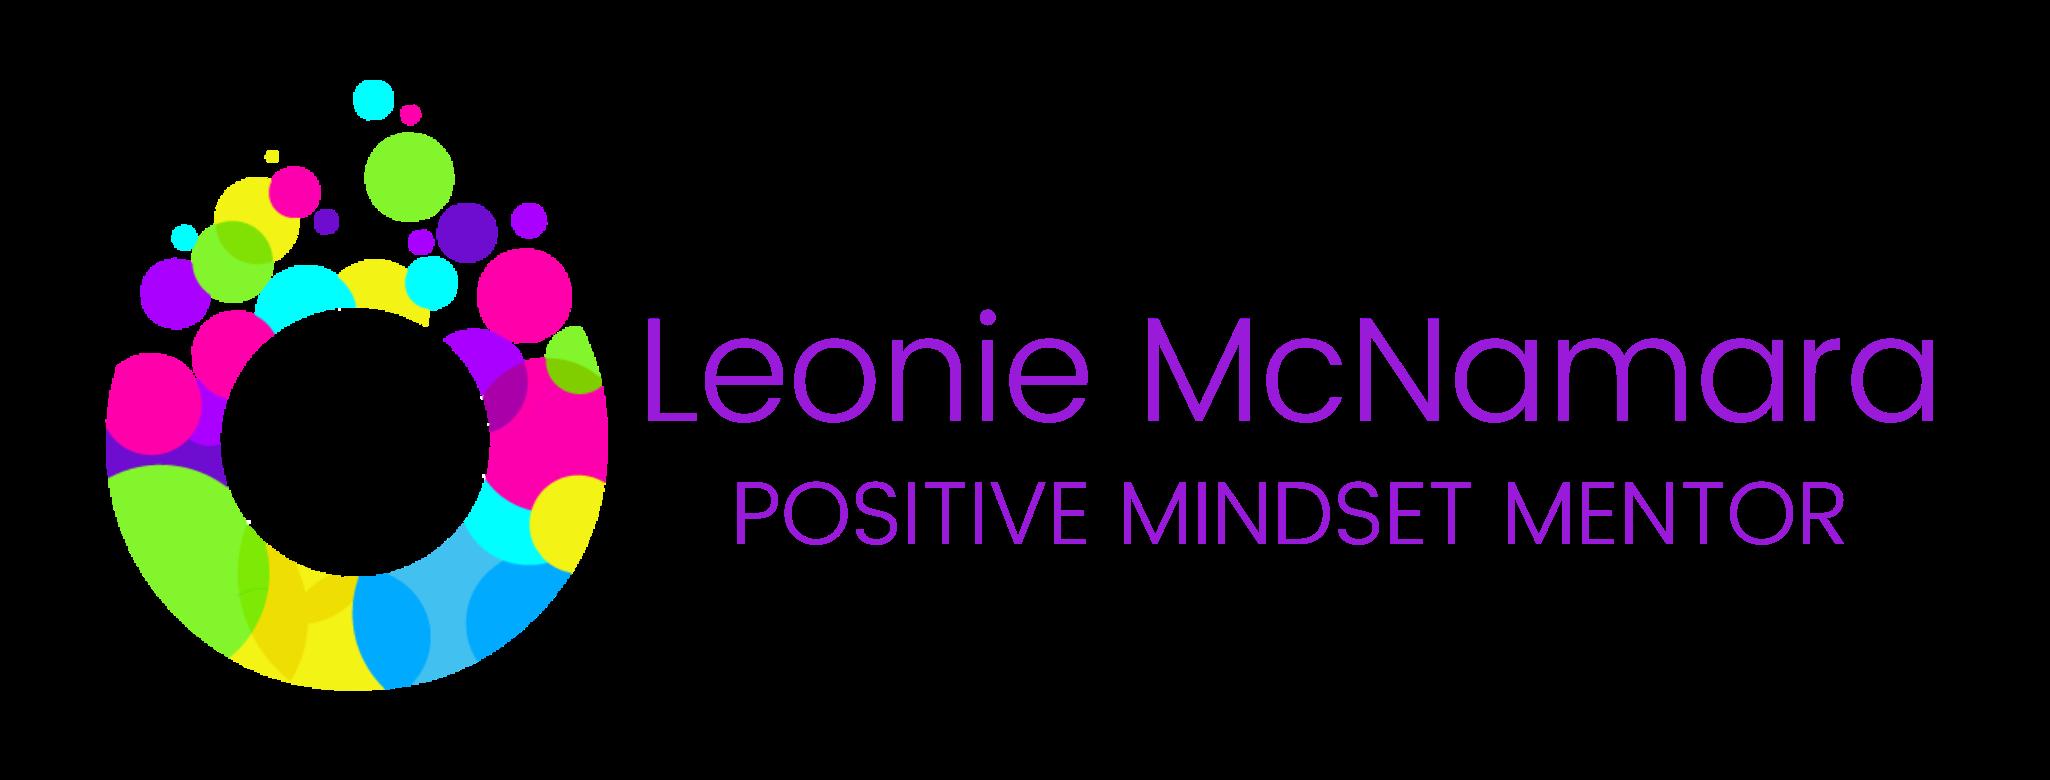 Leonie McNamara logo